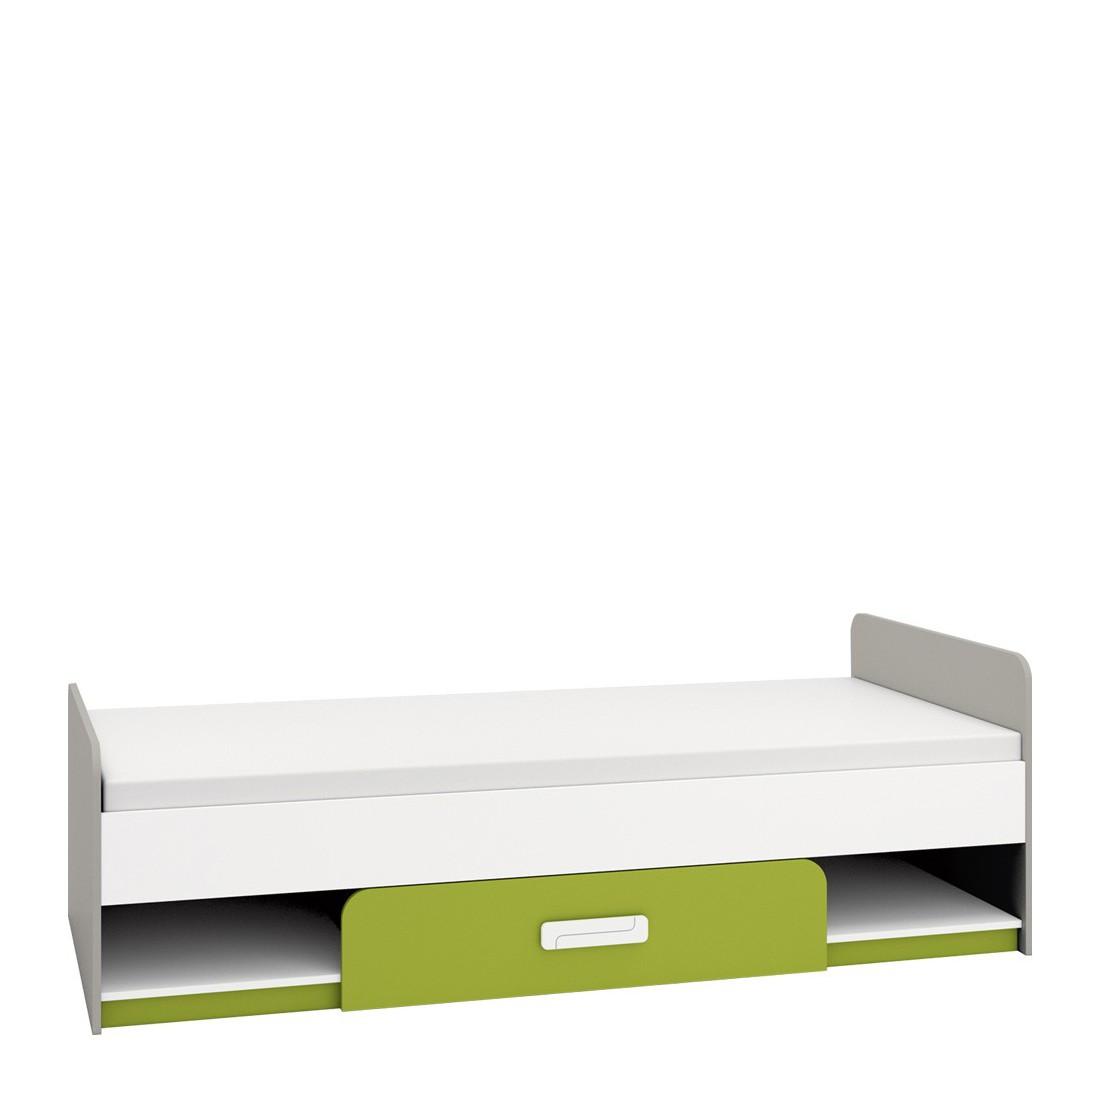 MEBLINE Lůžko 90x200 AIQ AQ12 šedá platina / bílá / zelený